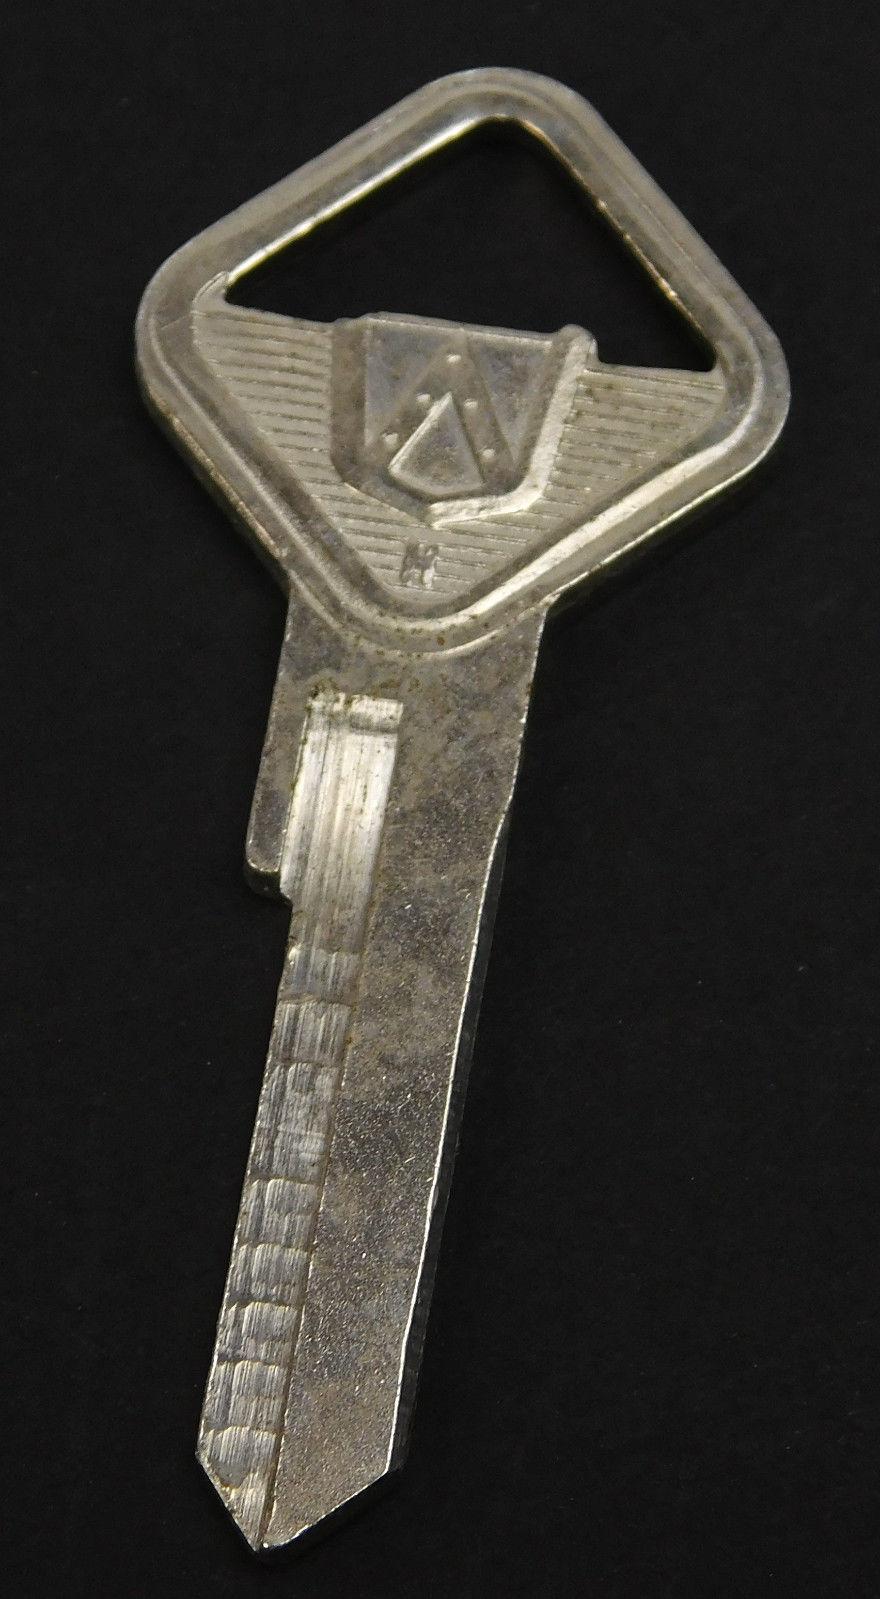 VTG Original Ford H Metal Triangular Shape Top Key Blank Uncut Key Made USA